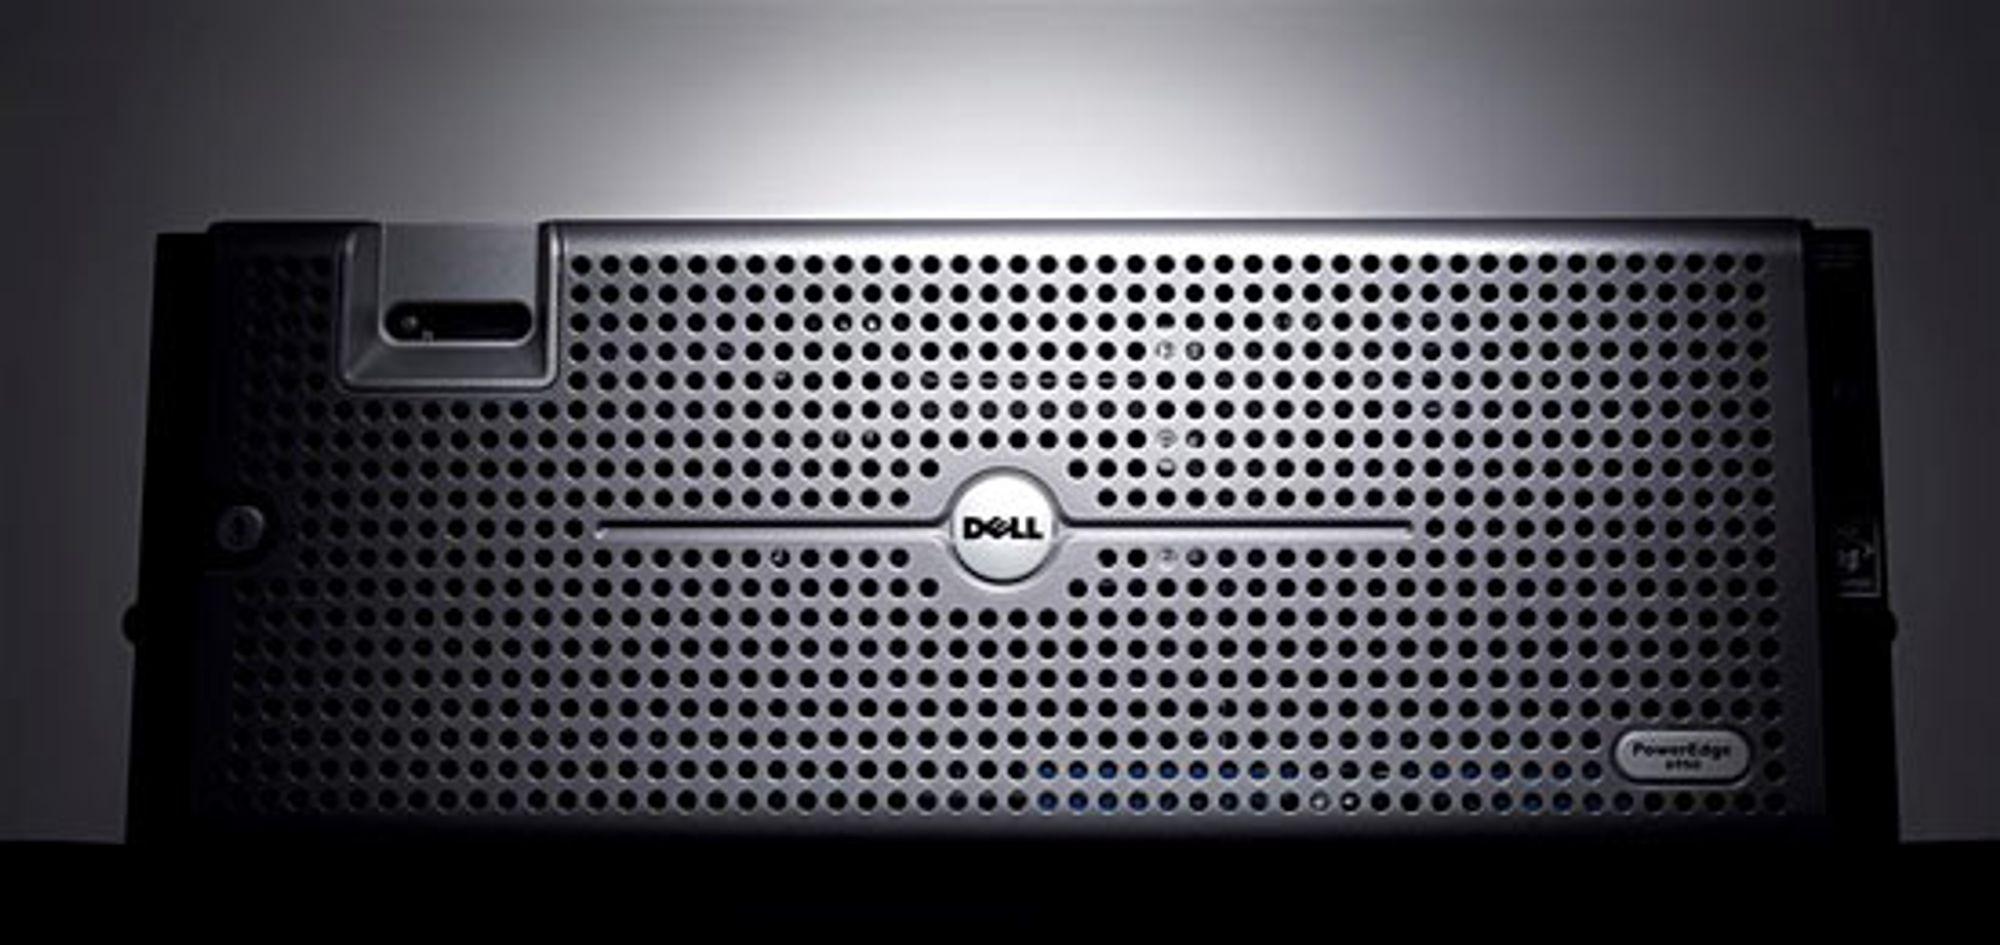 Dell PowerEdge 6950